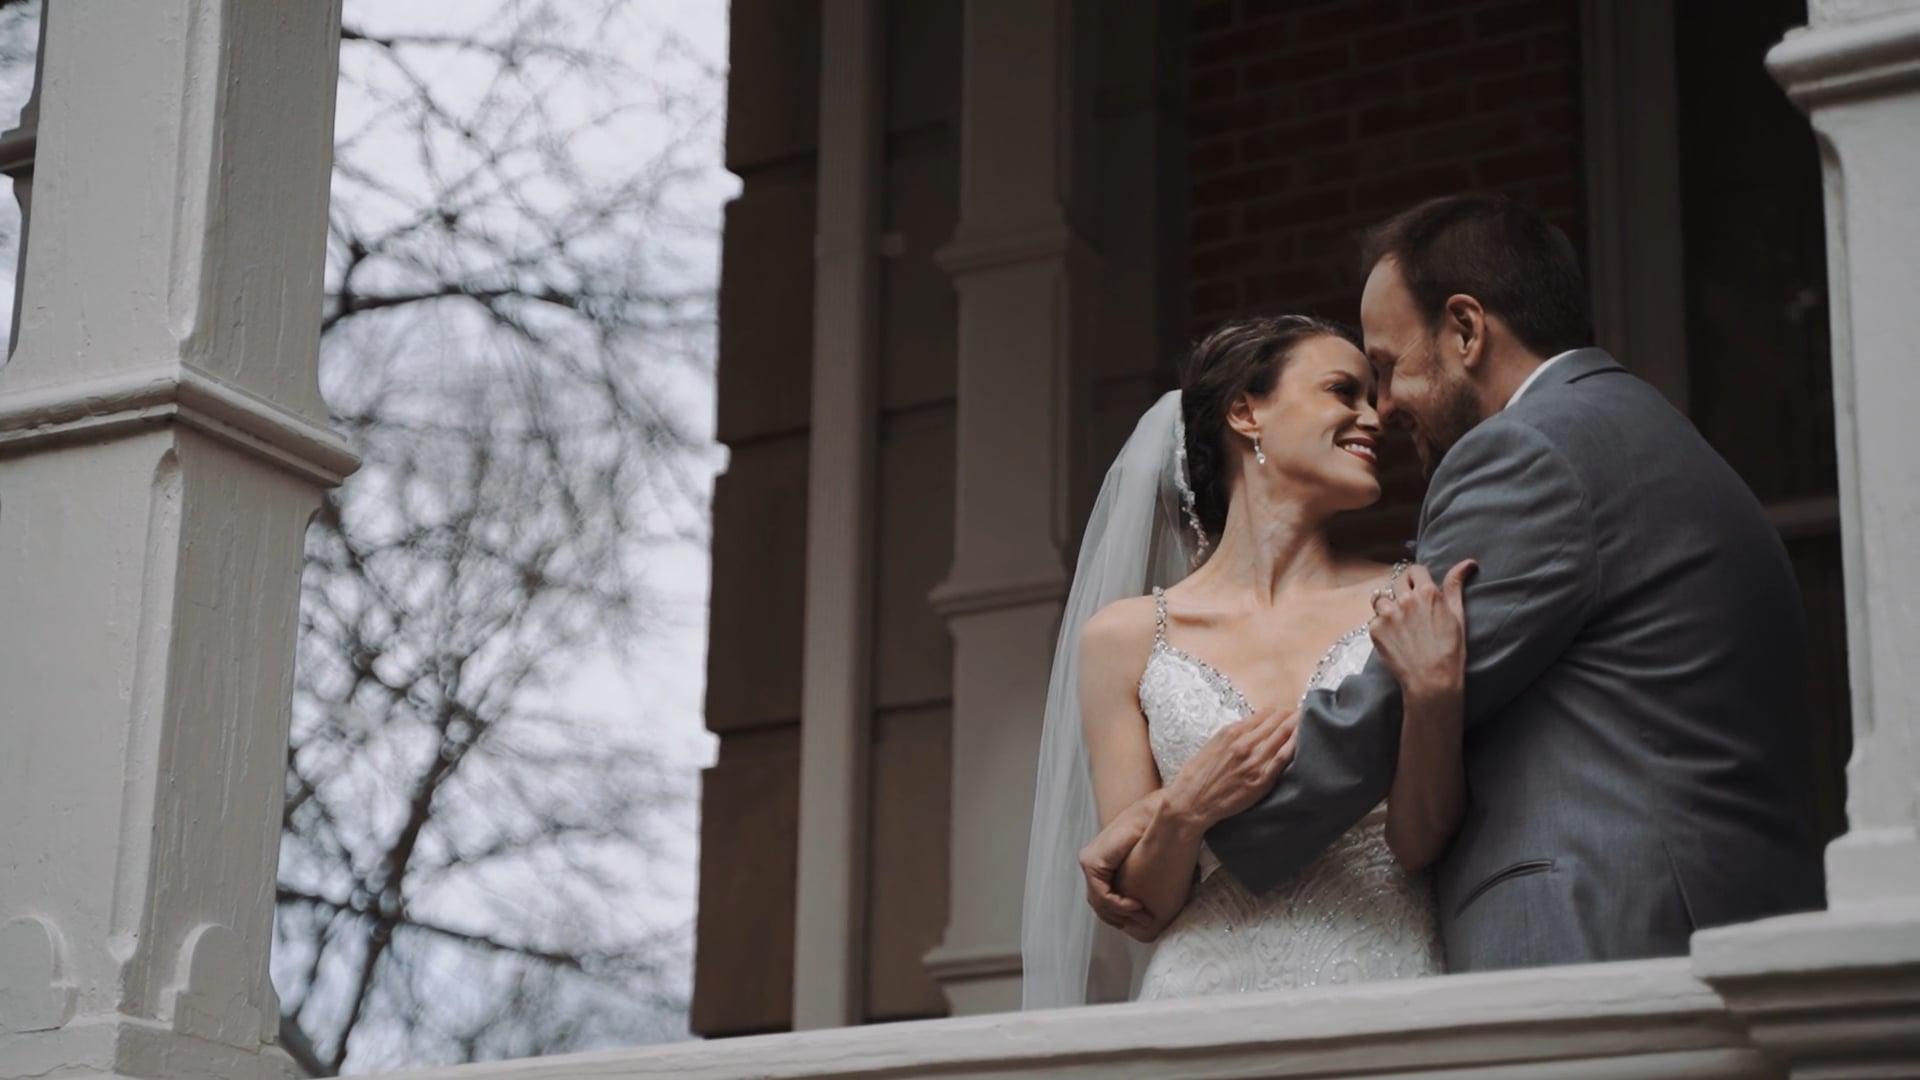 Reena + Josh Wedding Highlight Film.mp4